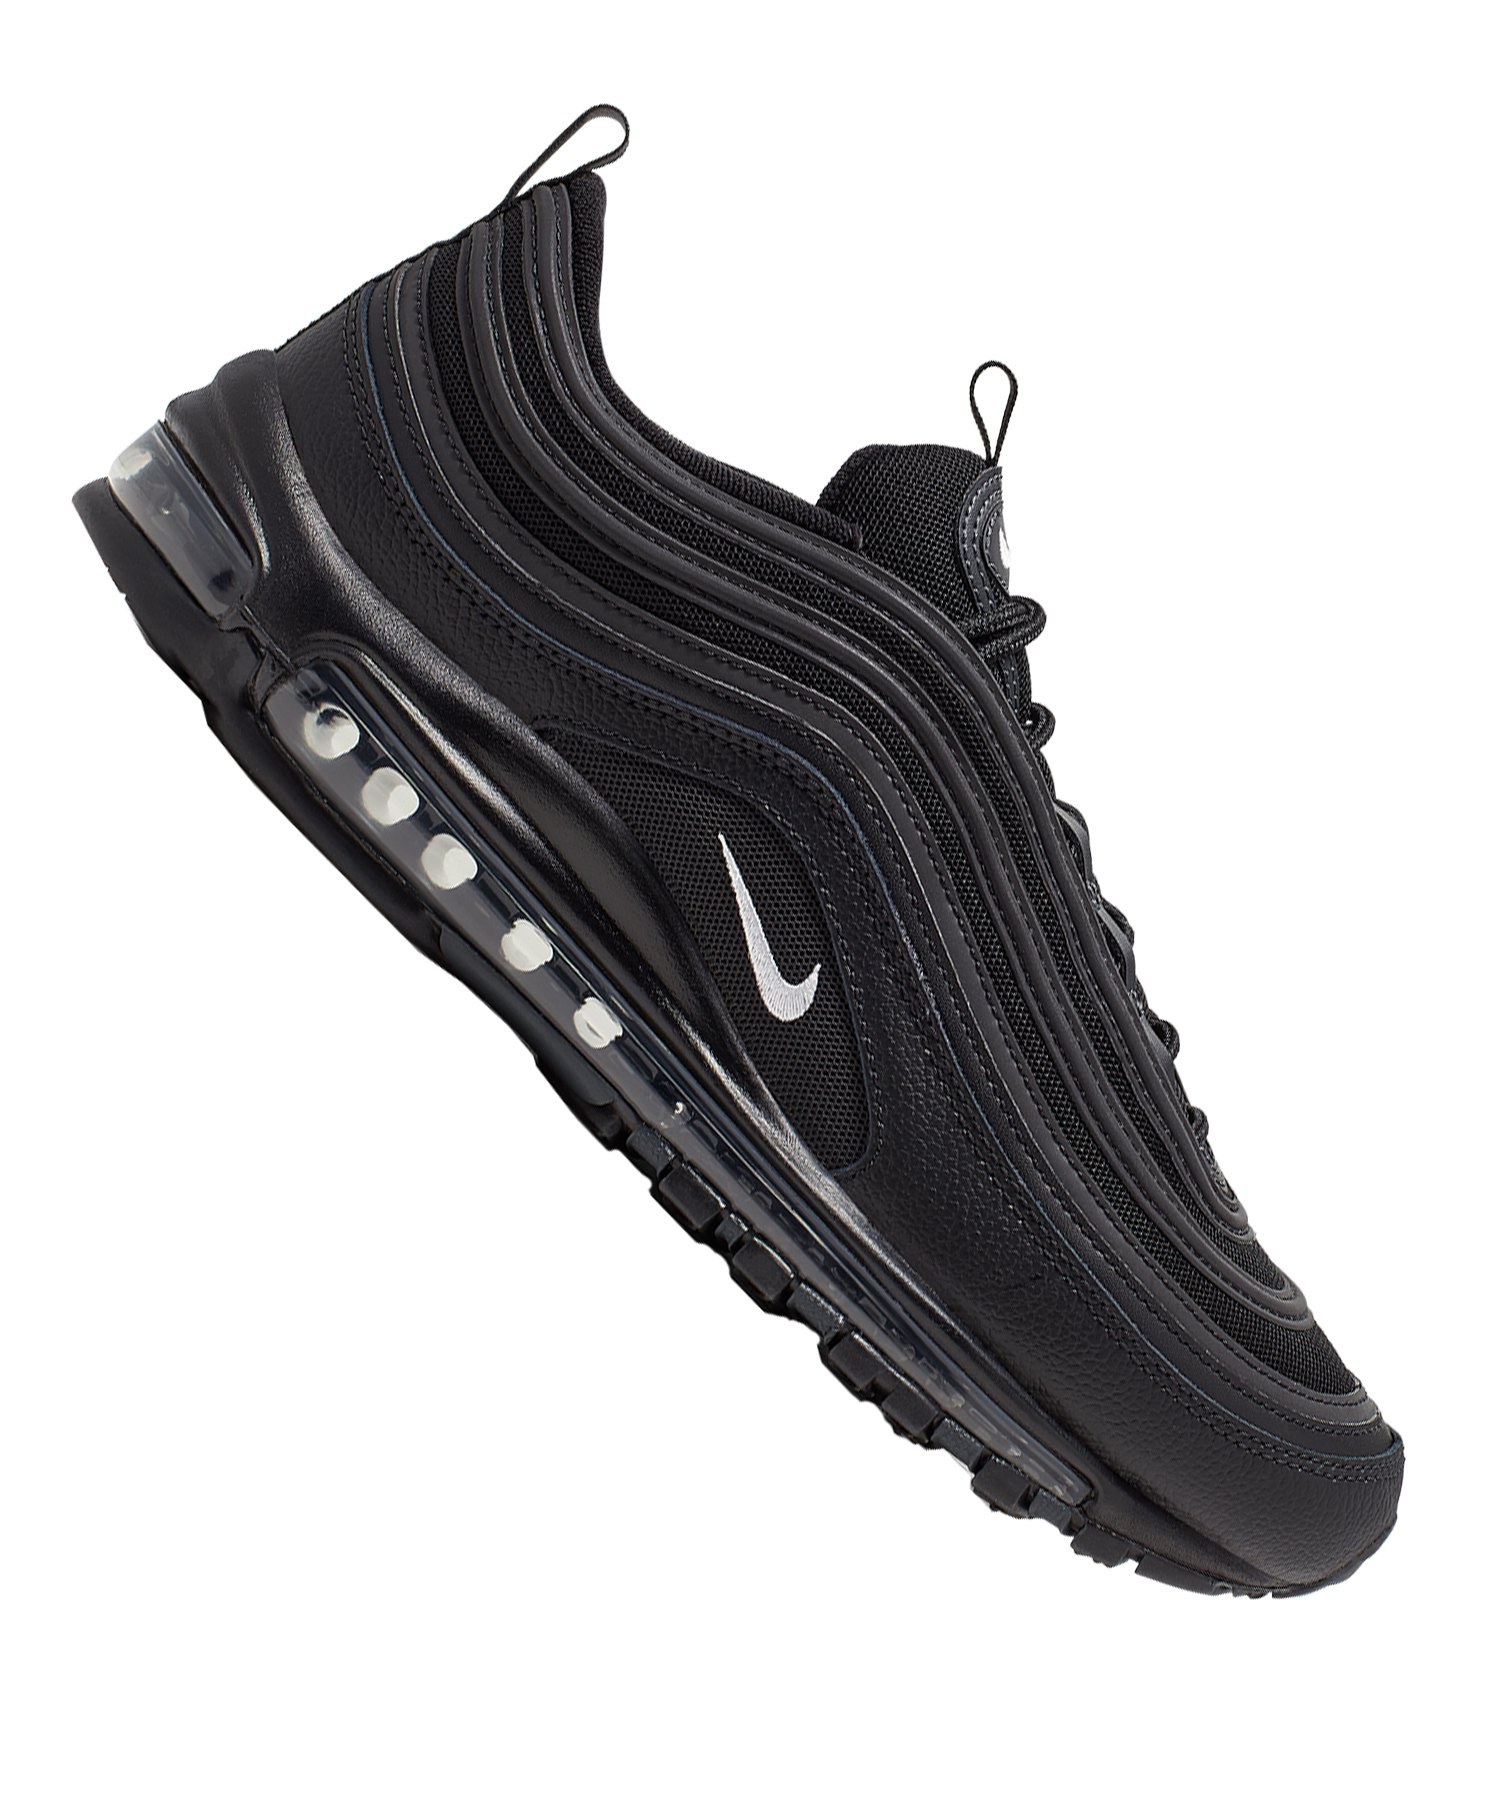 Nike Air Max 97 shoes black